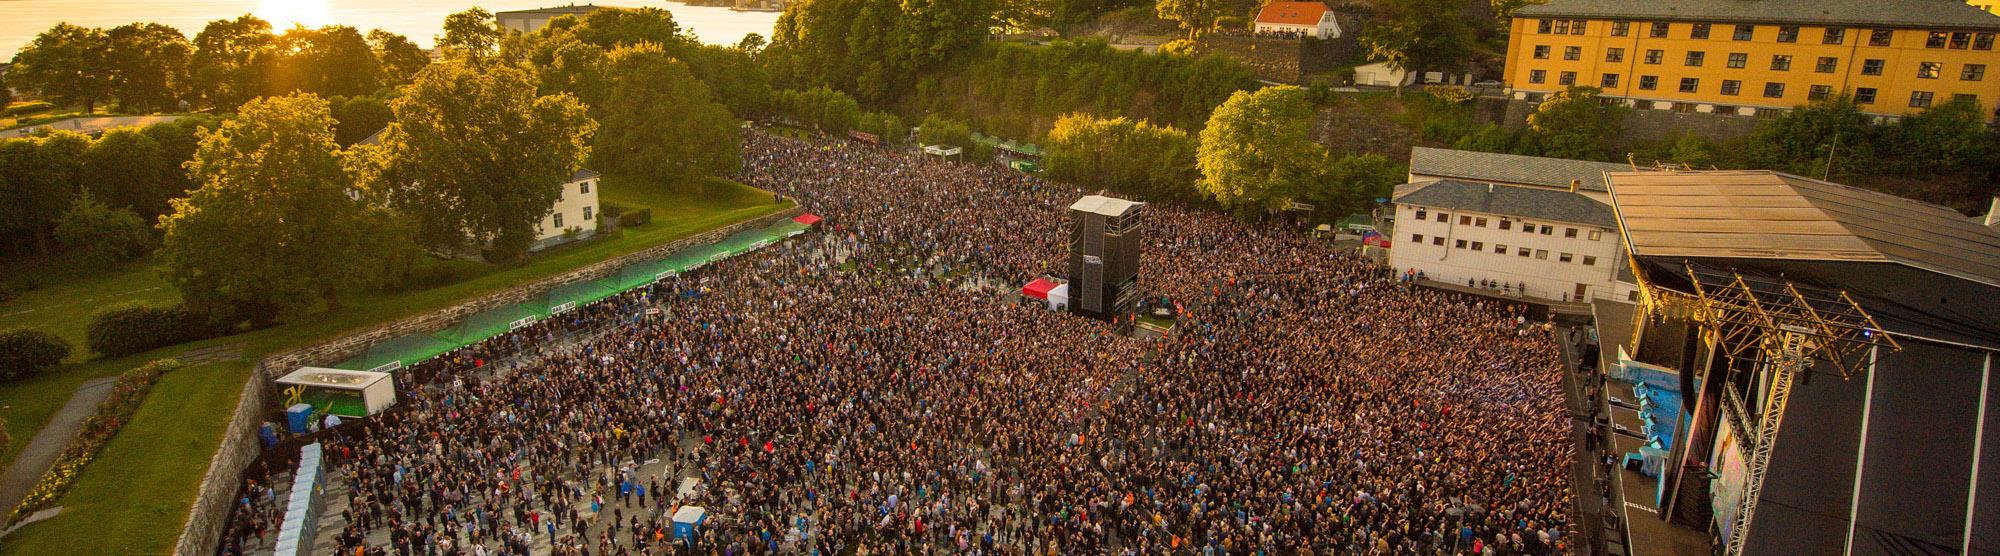 Festivals in Bergen